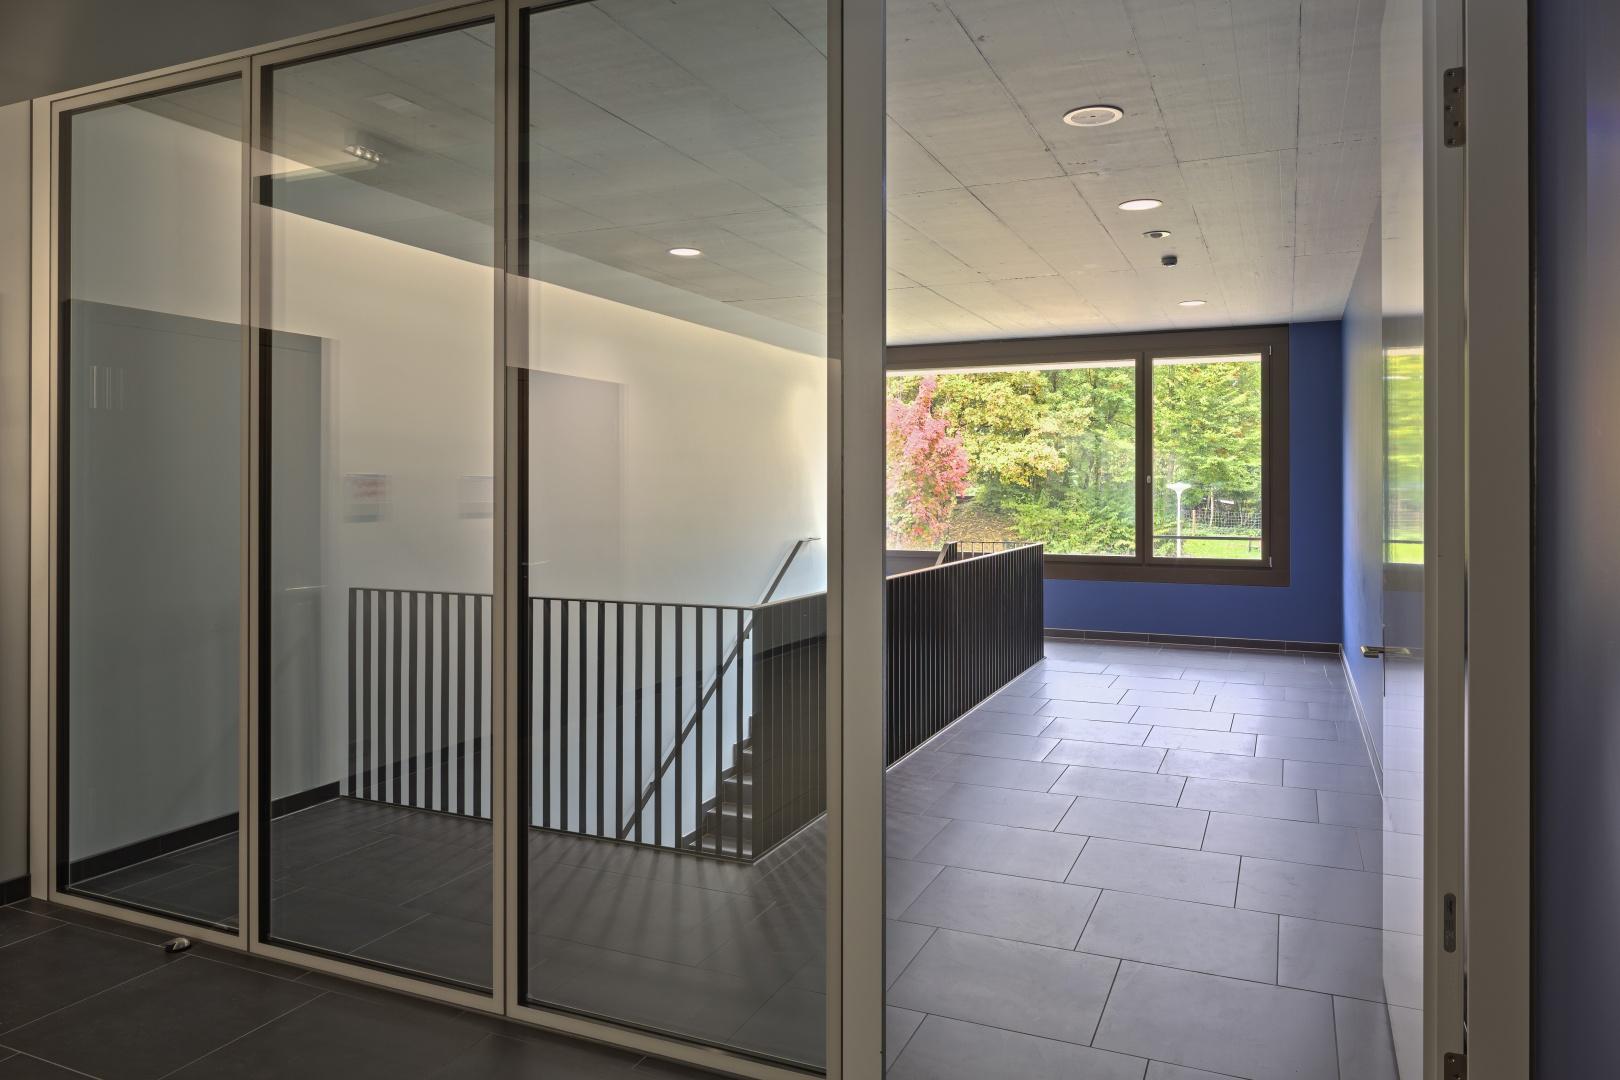 Treppenraum 1. OG © Stefano Schröter, 6003 Luzern